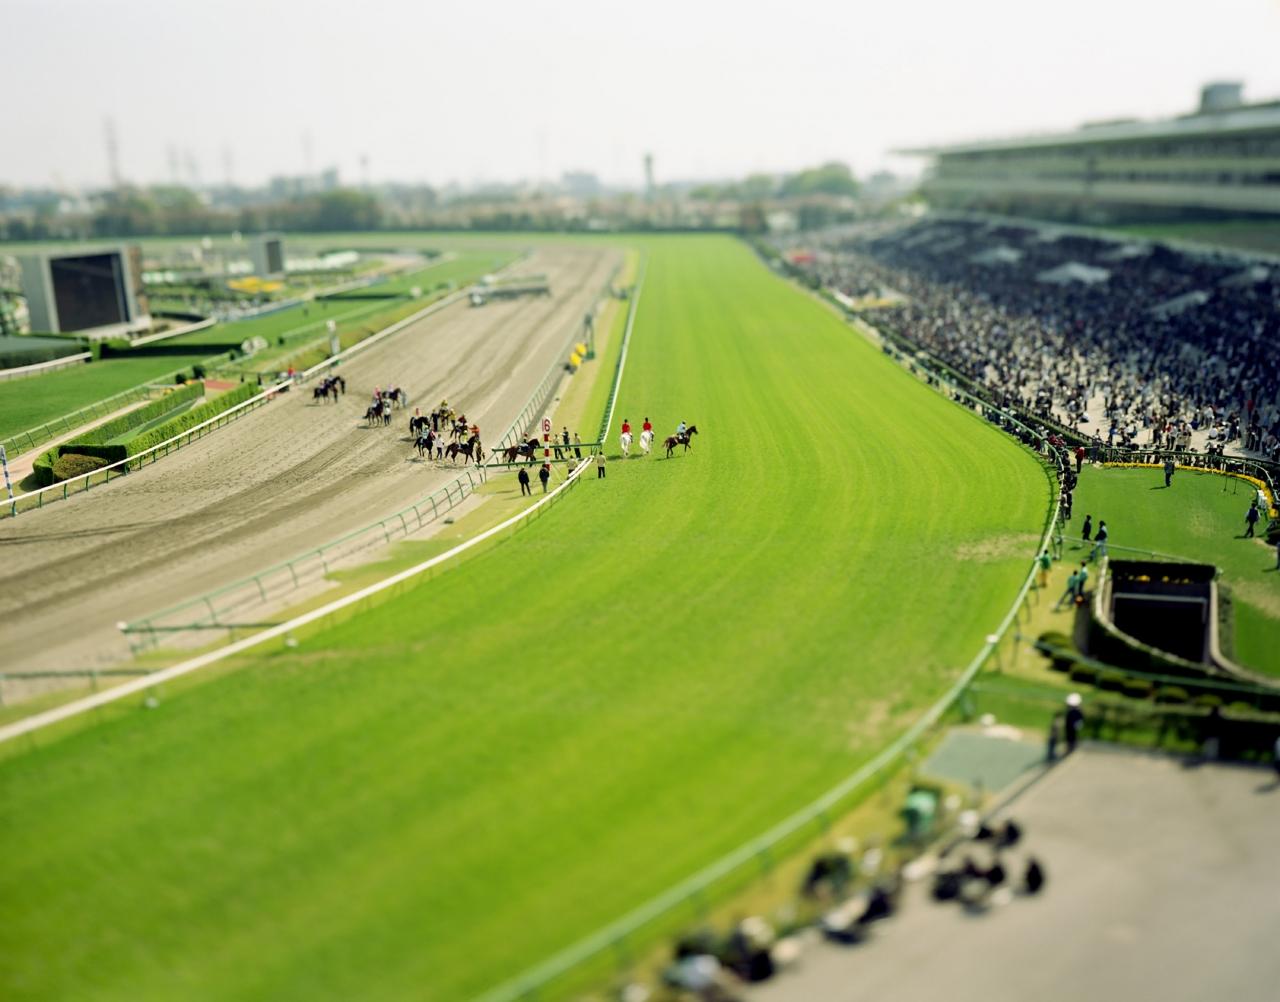 small planet / Nakayama Racecourse, Chiba, Japan / 2005 ©Naoki Honjo